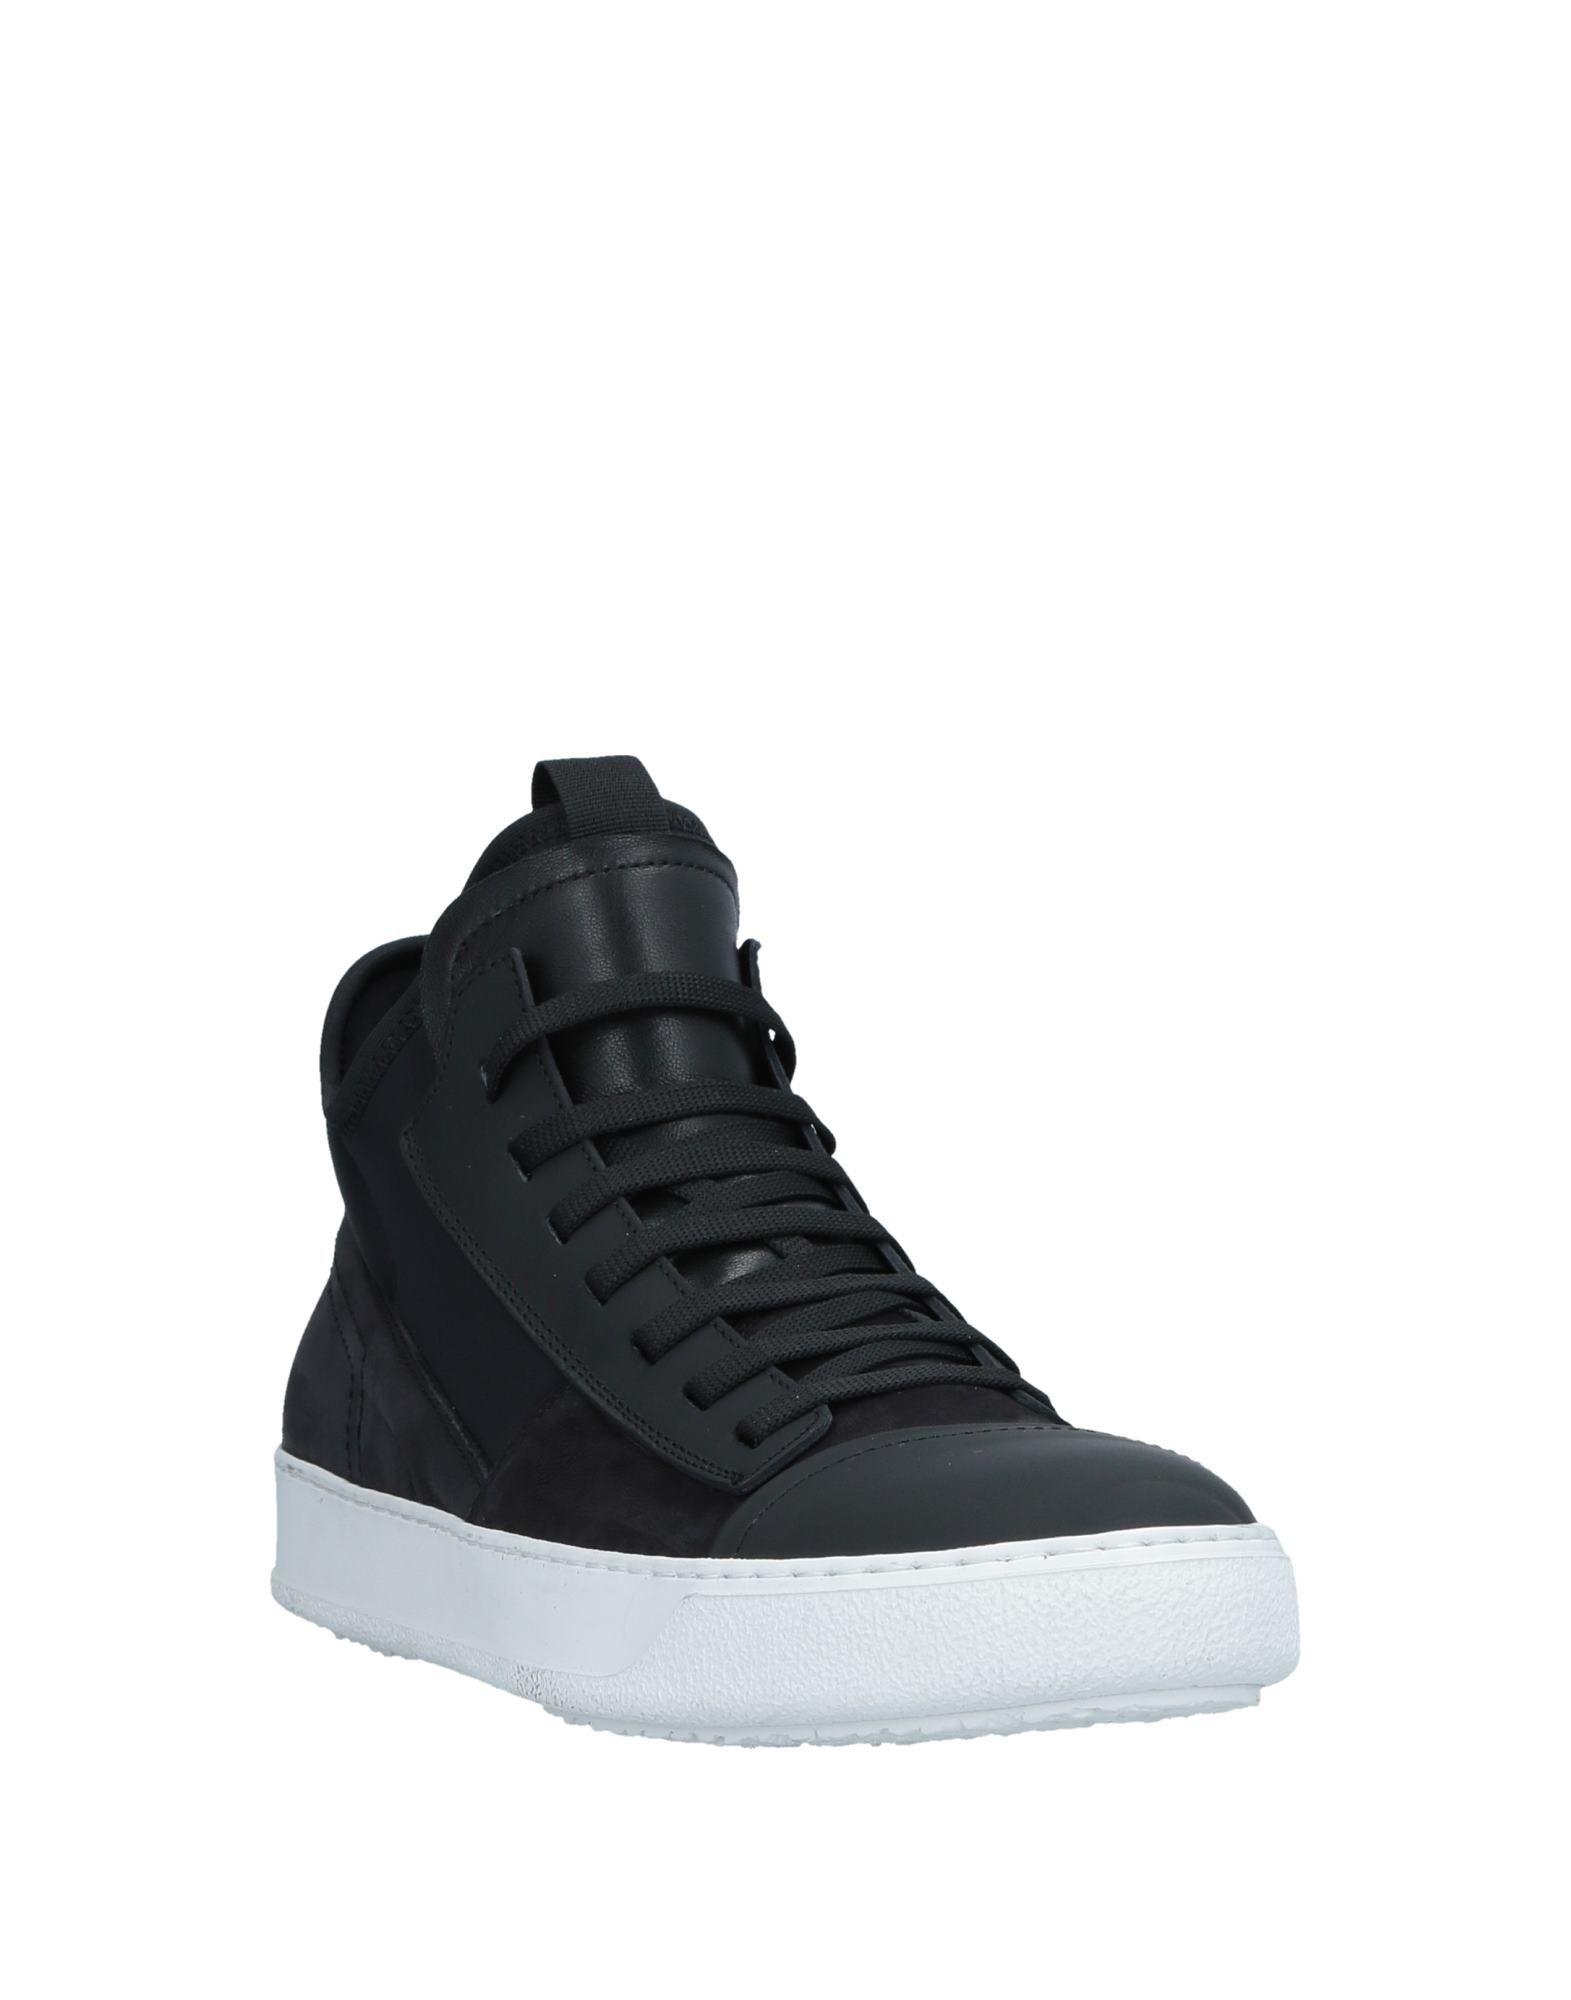 Bruno Bordese Sneakers Herren  11527353QN Gute Qualität beliebte Schuhe